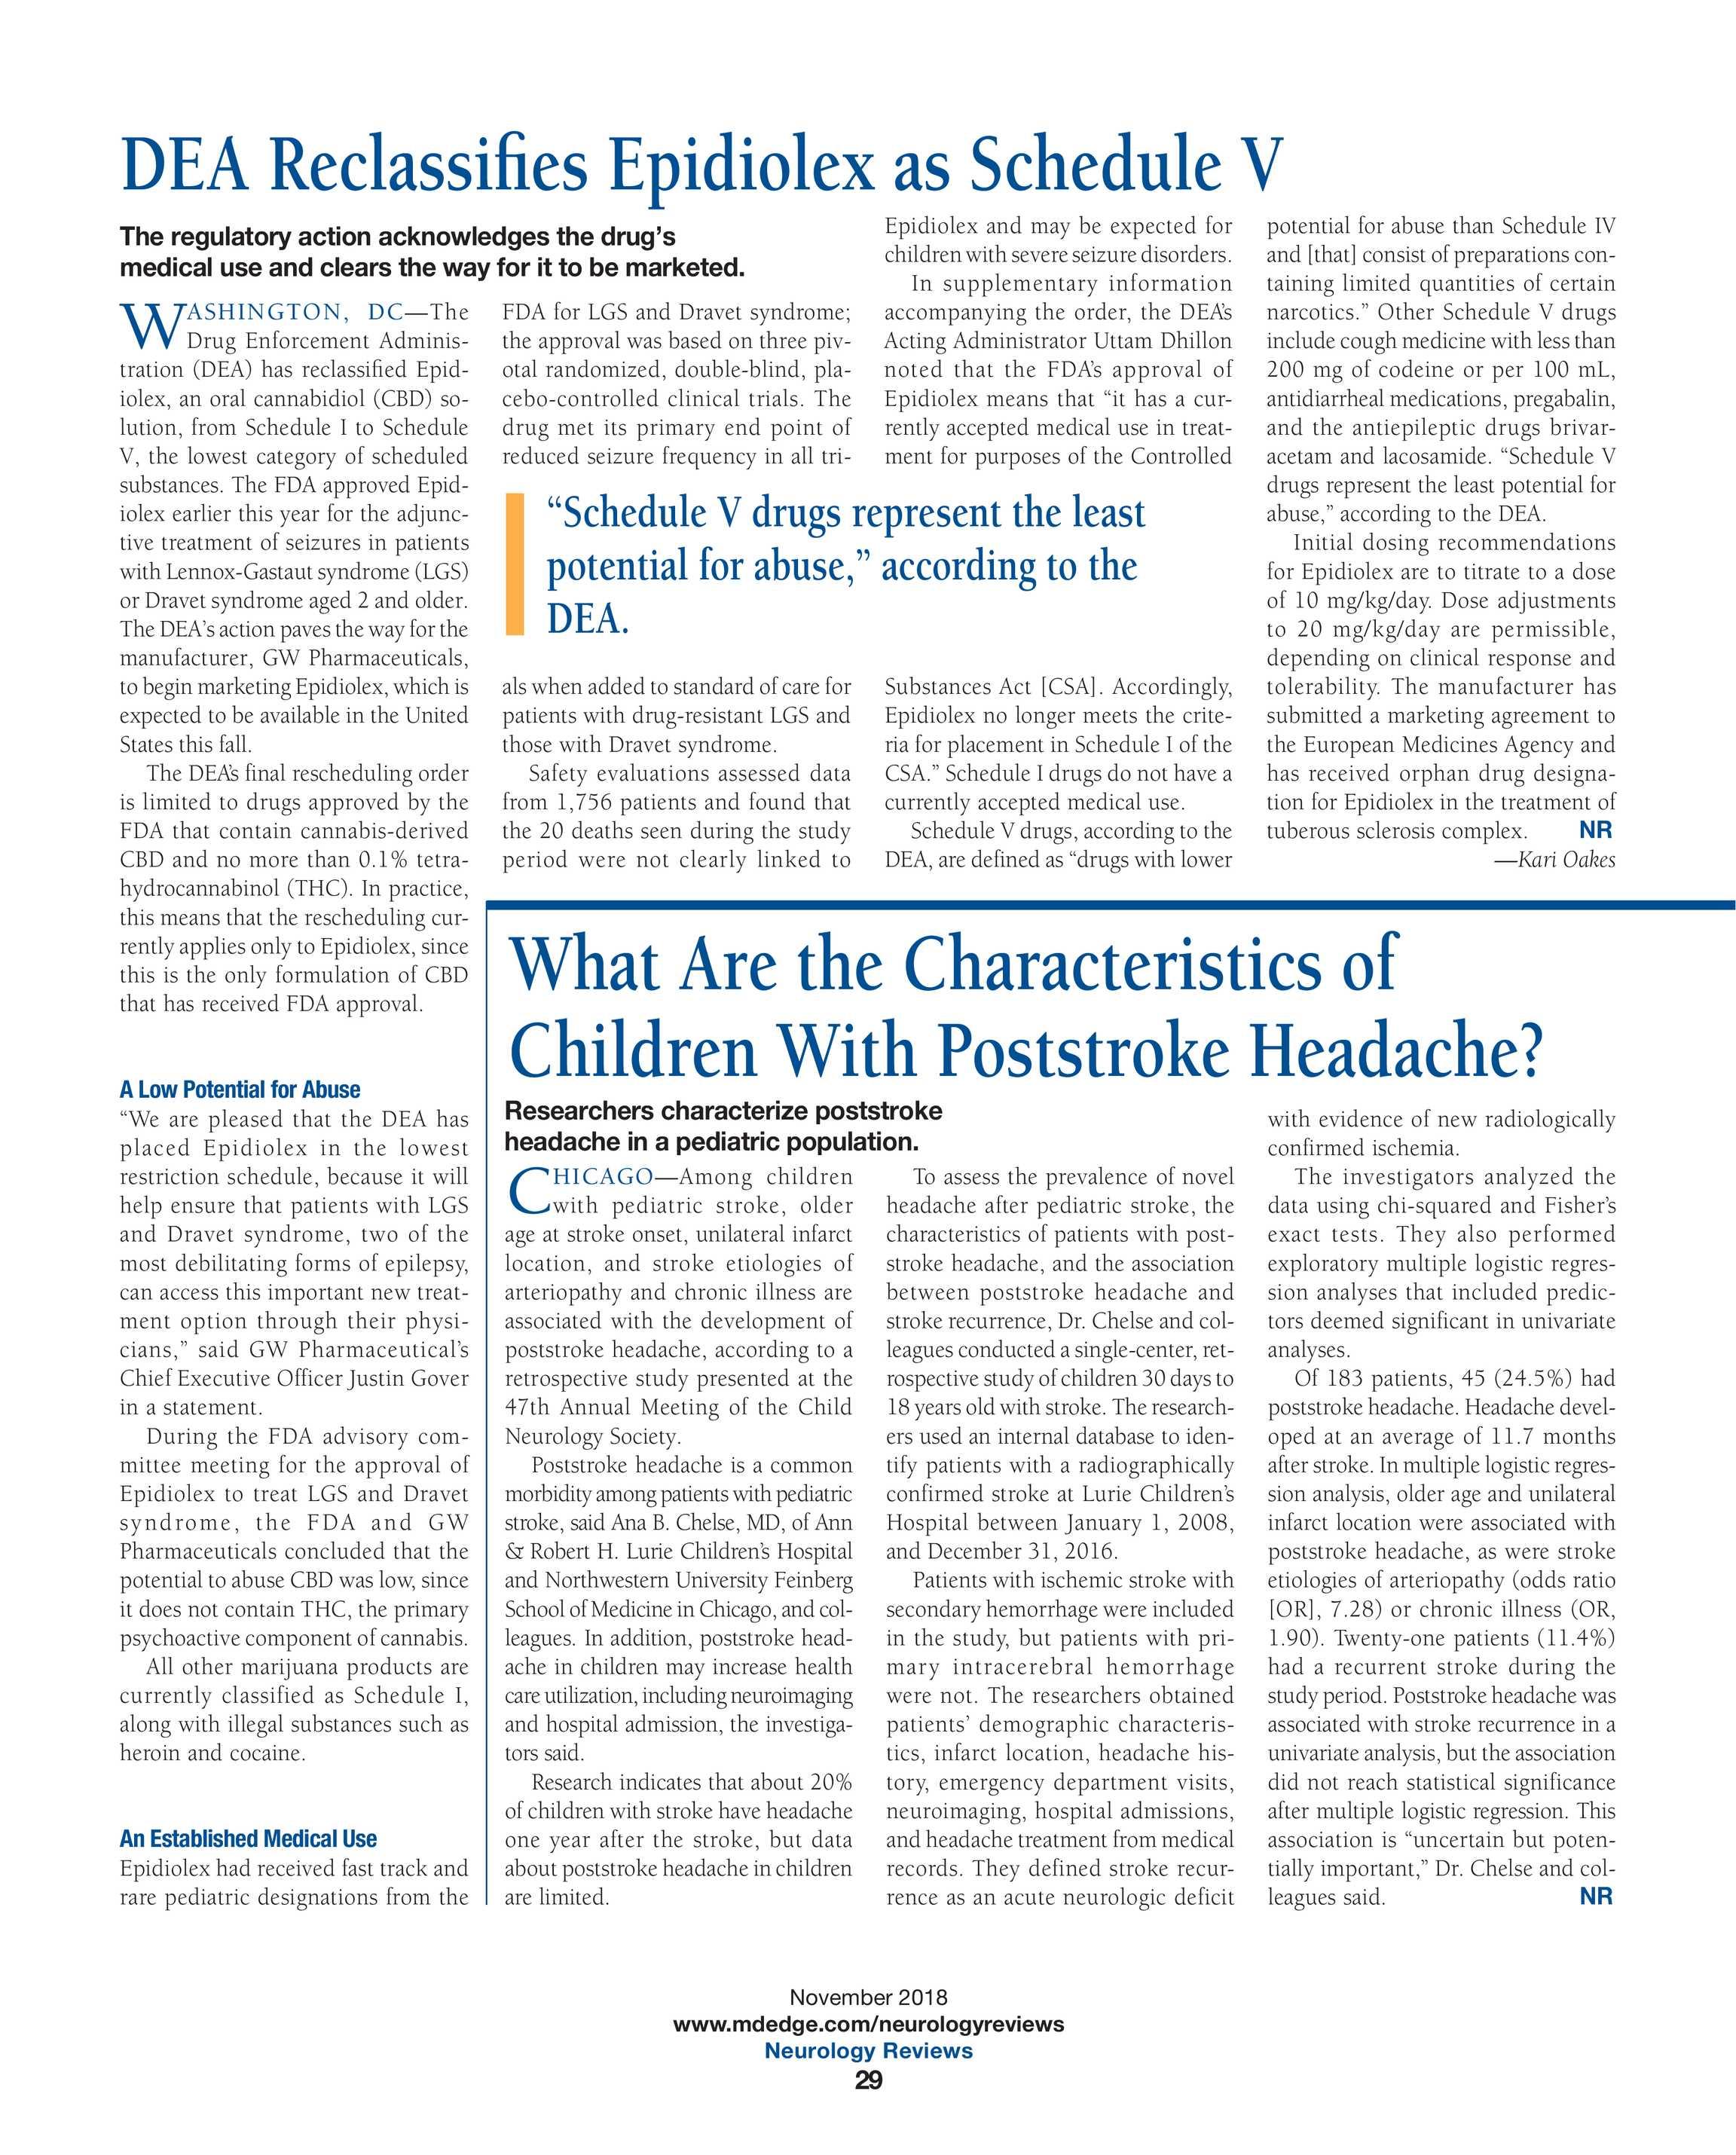 Neurology Reviews - NR NOV 2018 - page 29